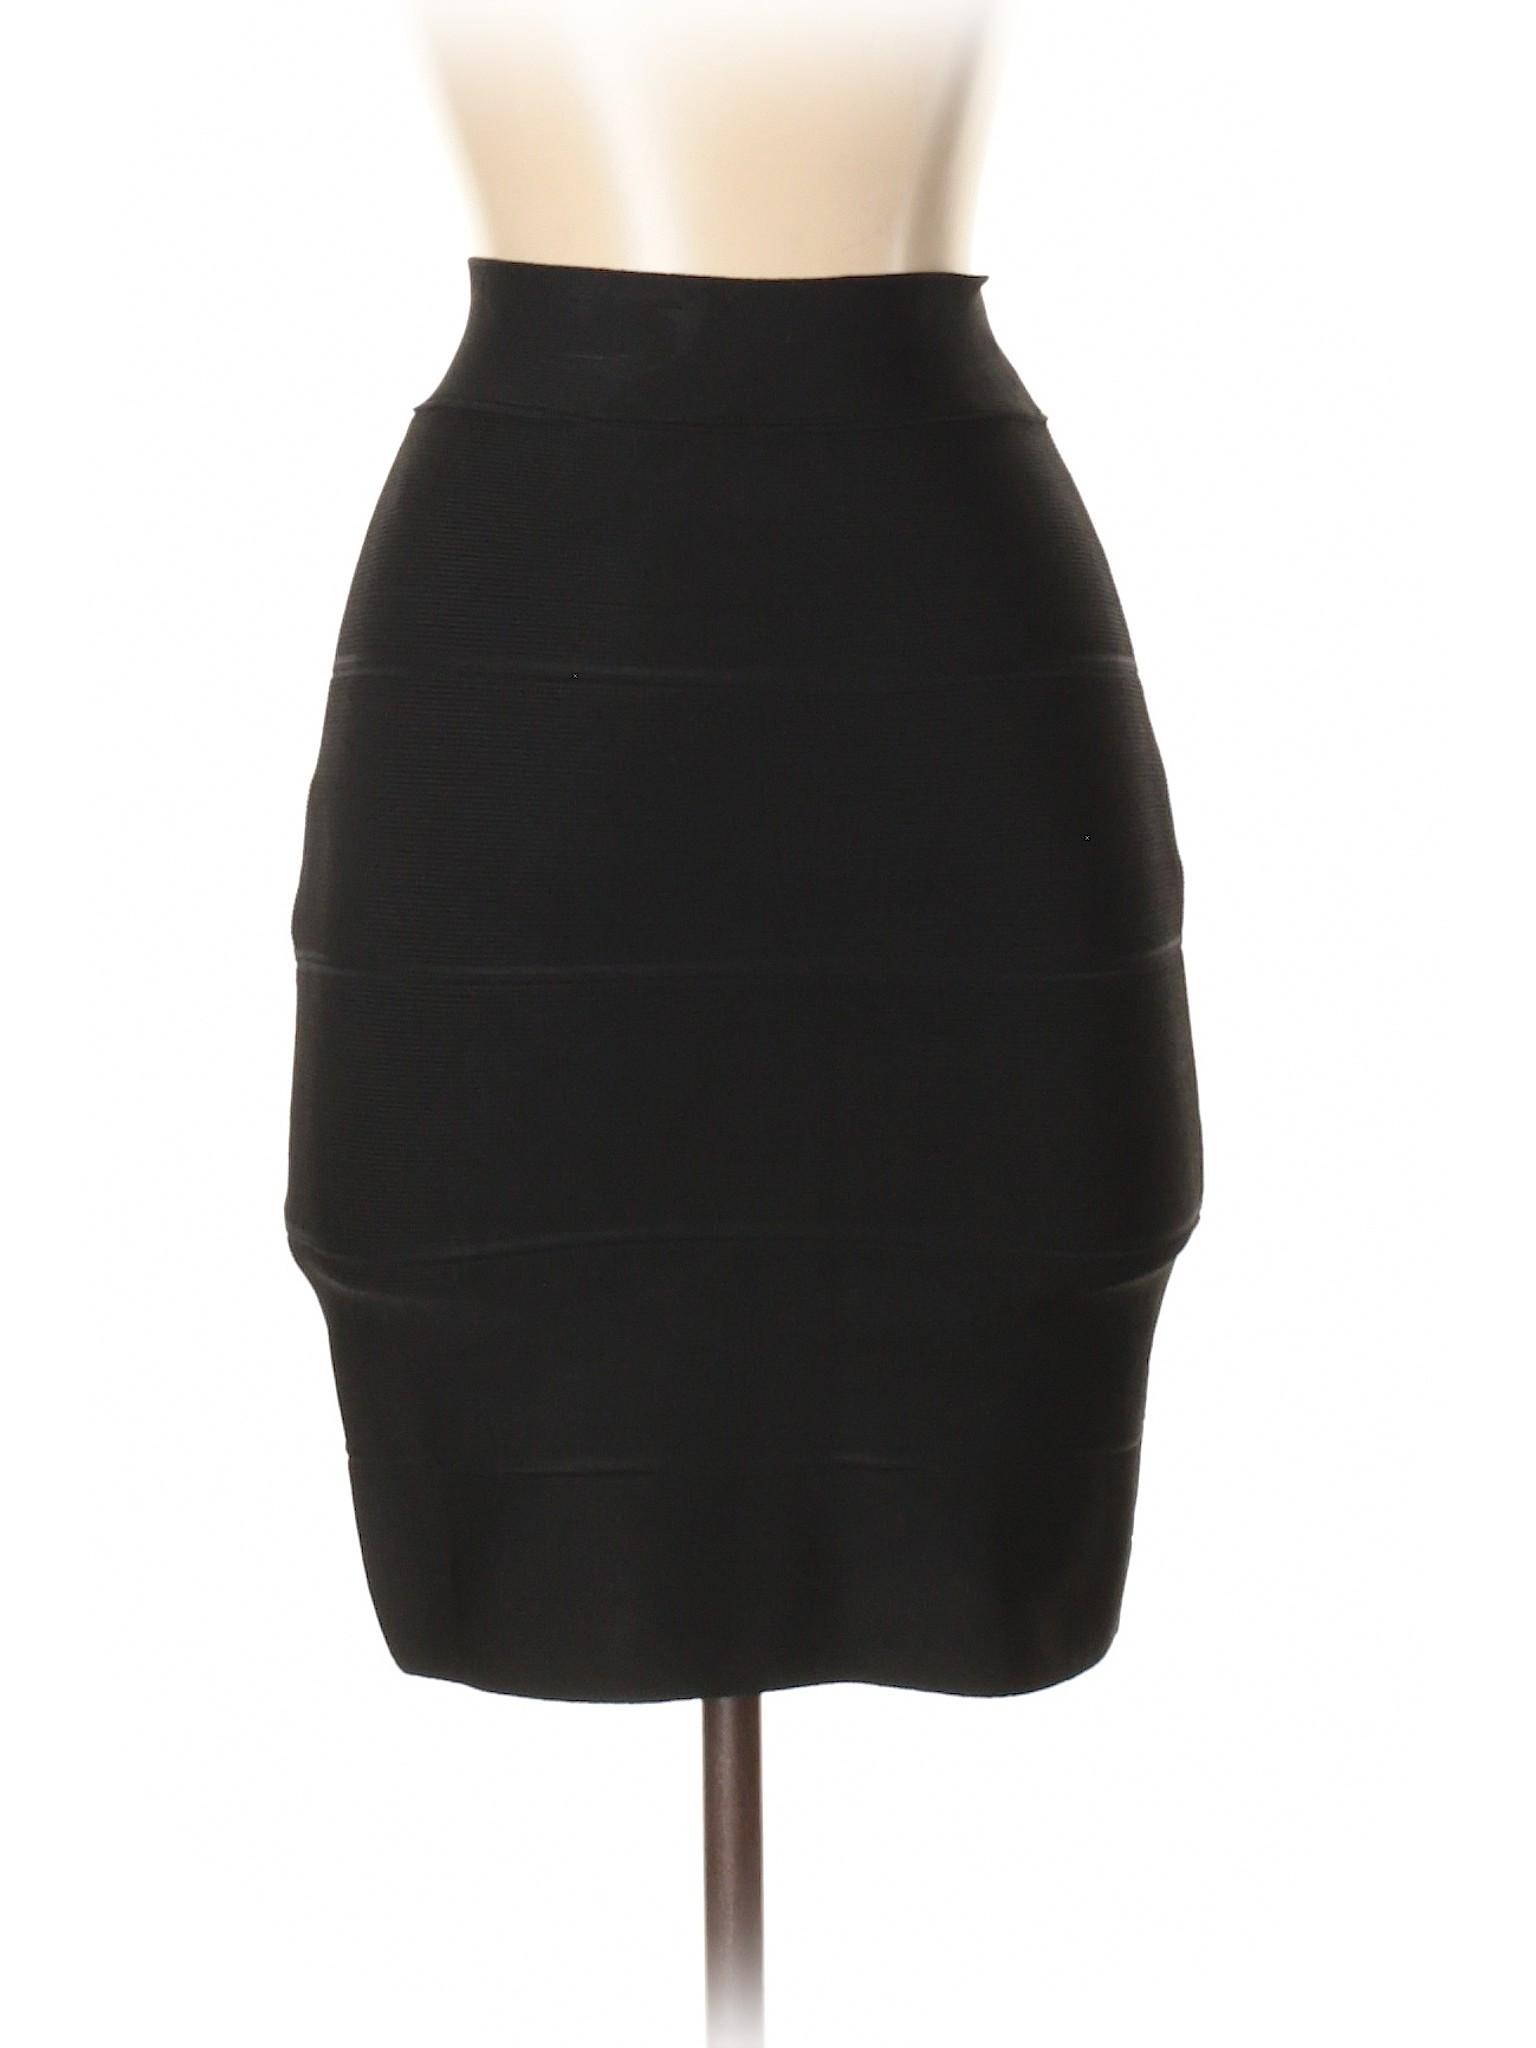 Casual Boutique Boutique Casual Skirt Boutique Skirt Casual P7xwEq8R